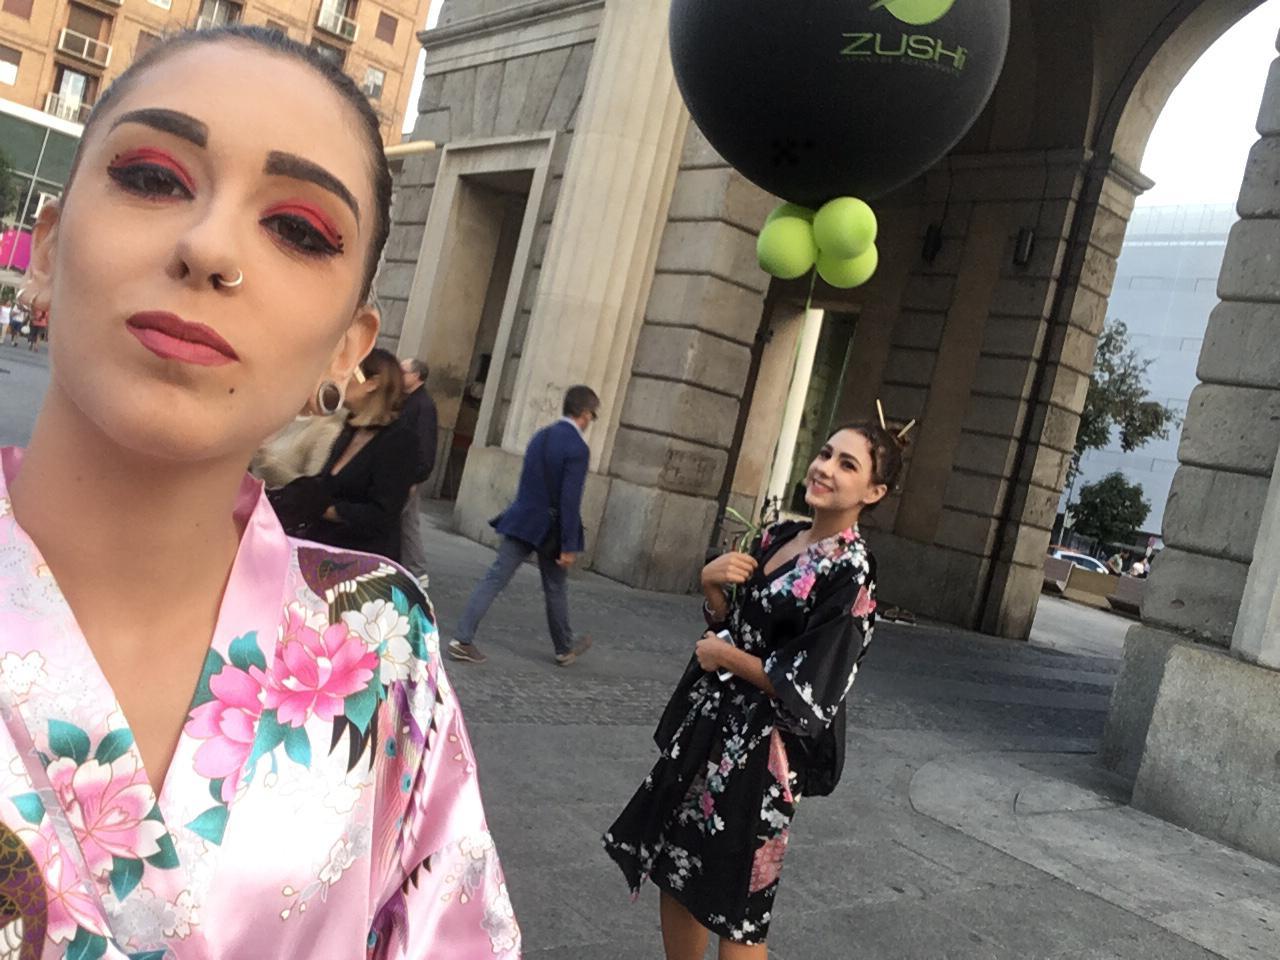 Hostess a Milano